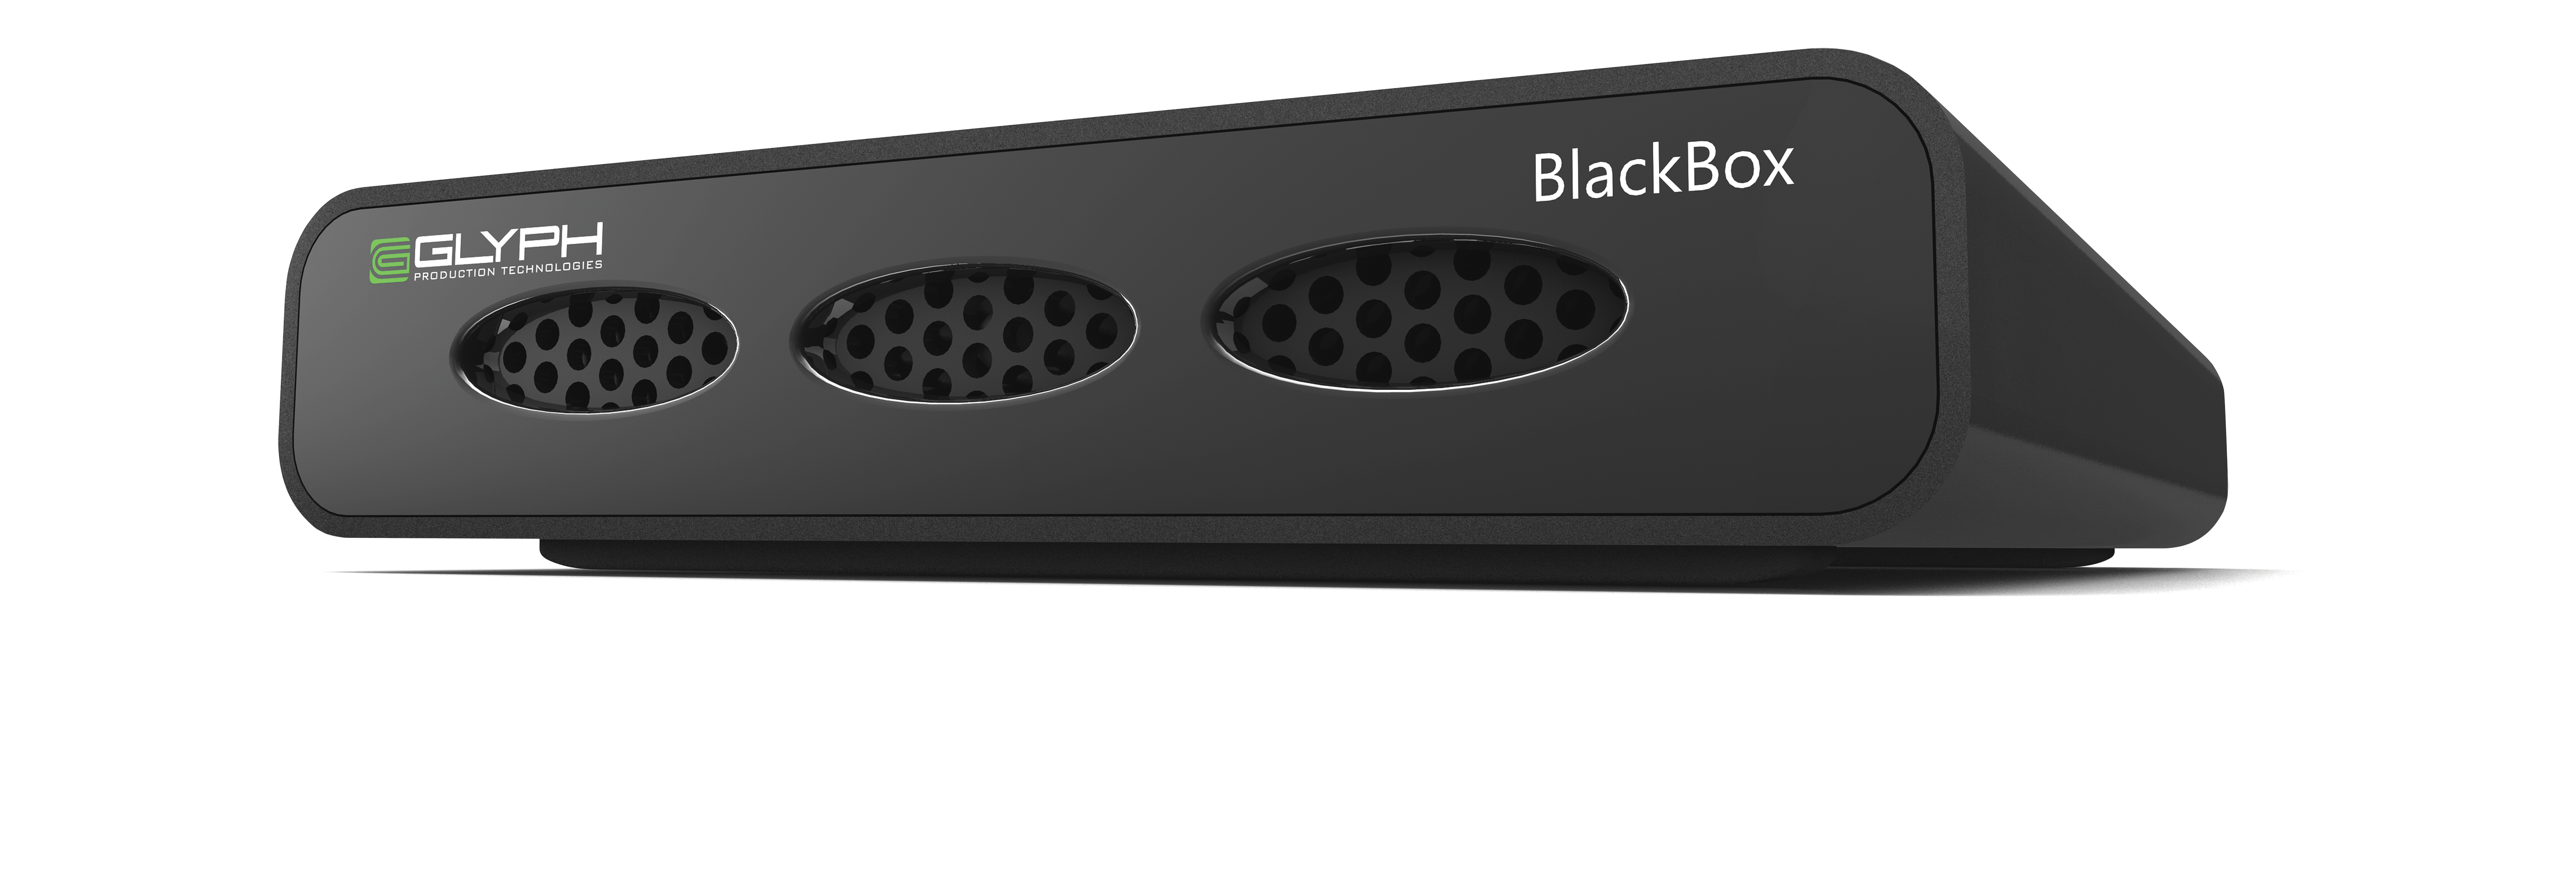 blackbox usb front